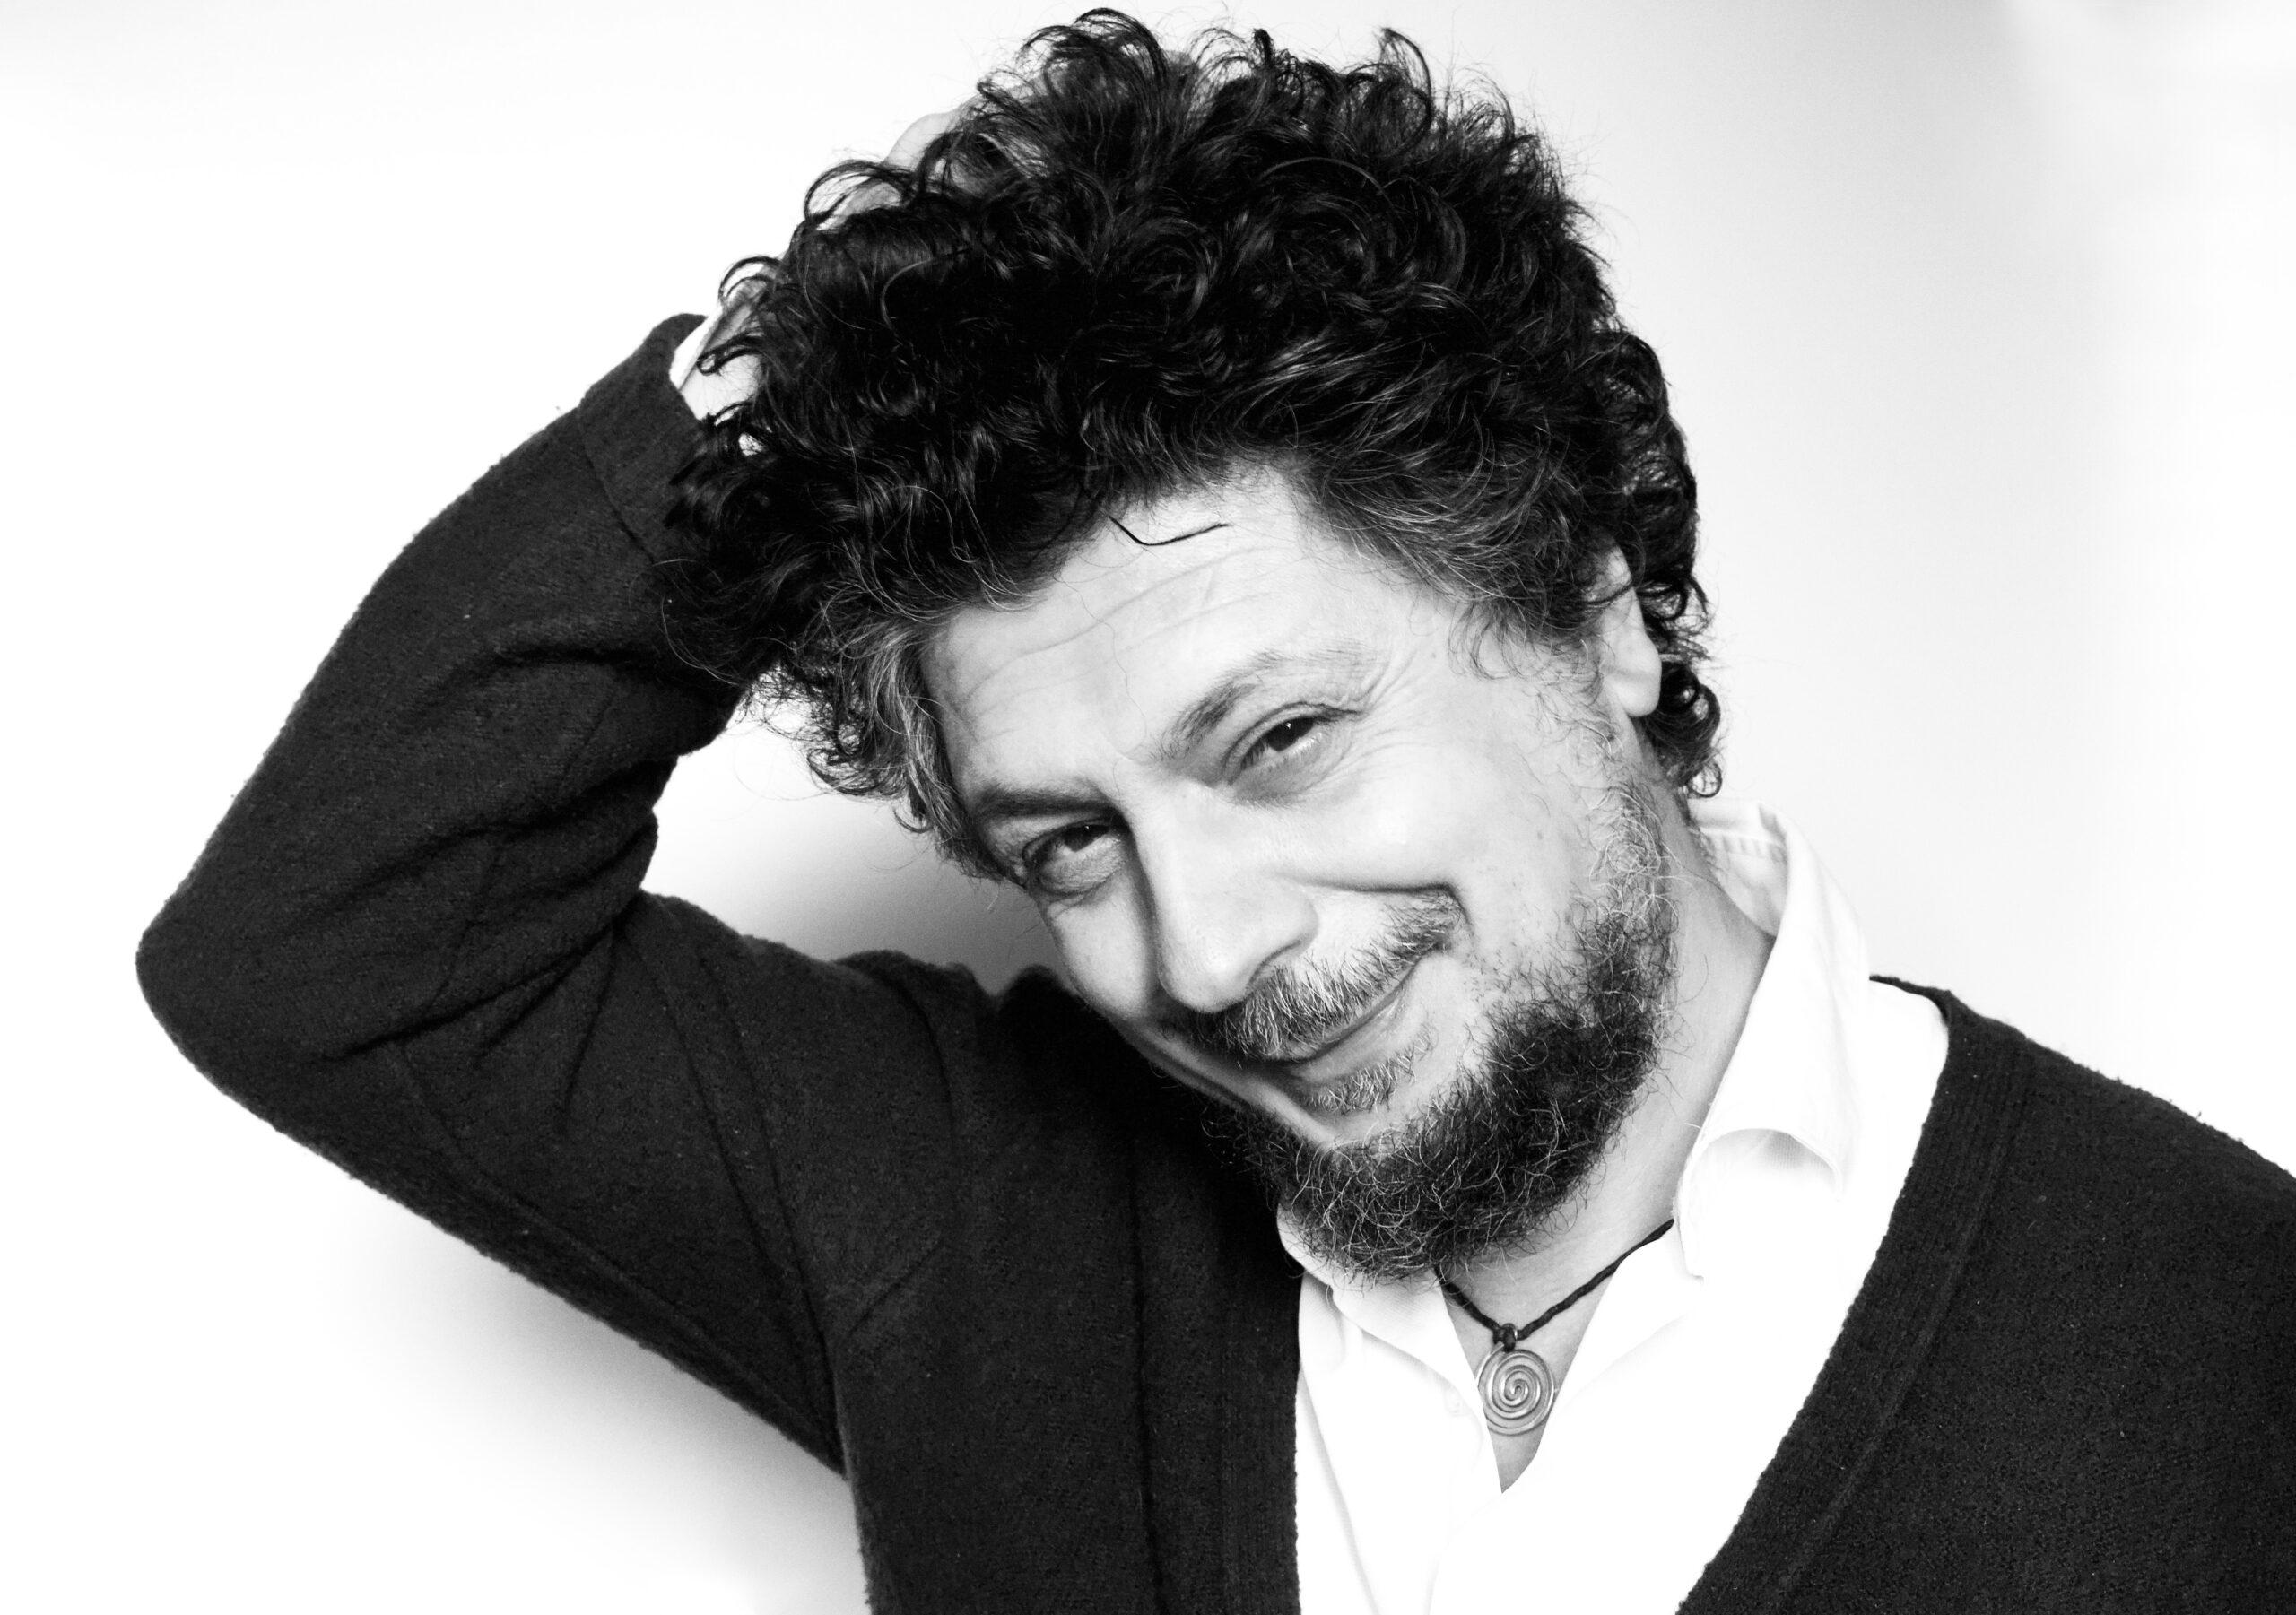 Franco Adamo Balestrieri